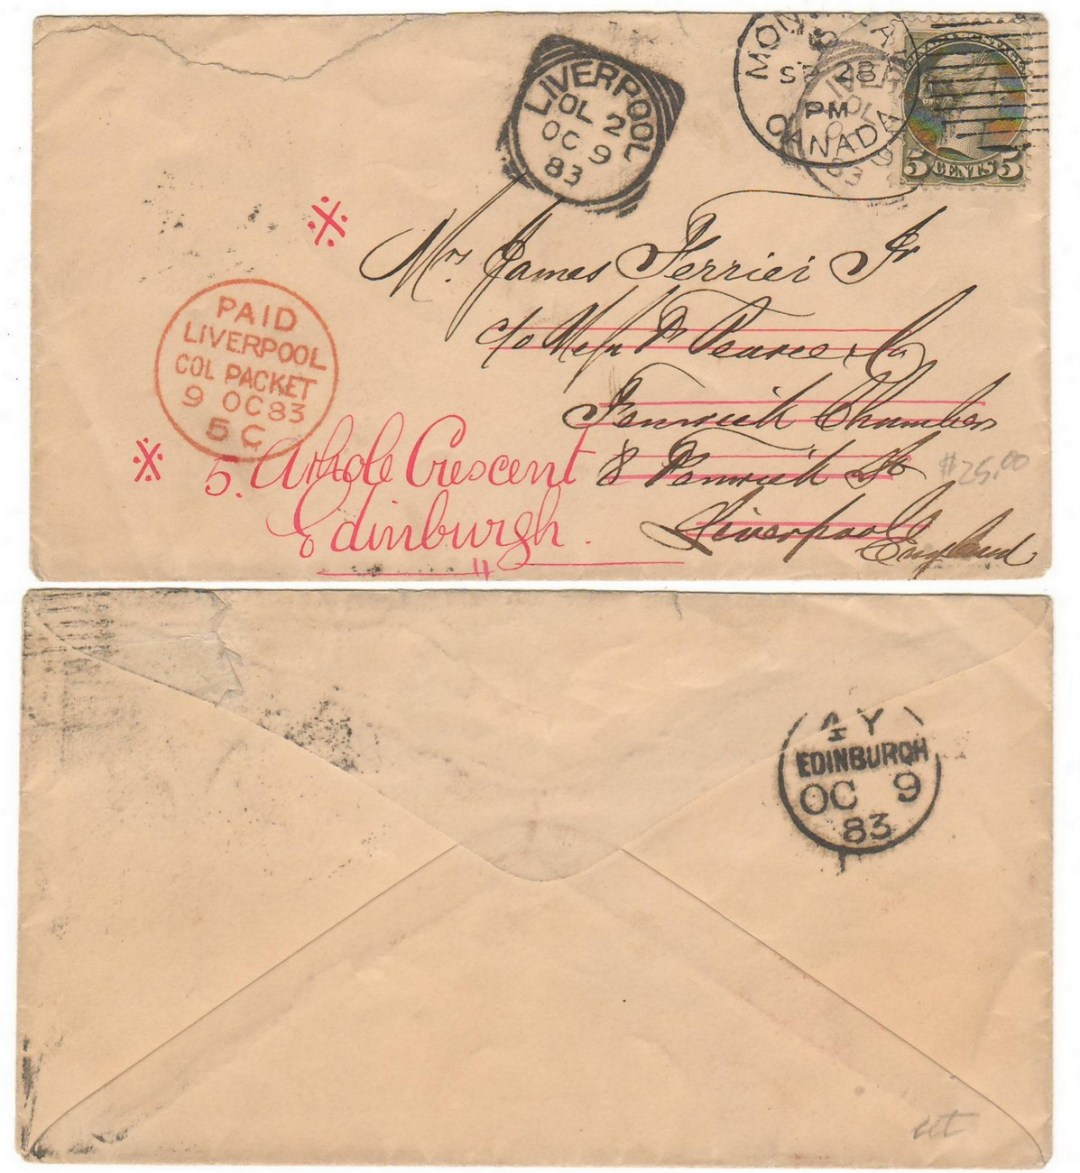 19 Canada #38 1883 5c SQ Transatlantic readdressed Cover, tear ex Robinson